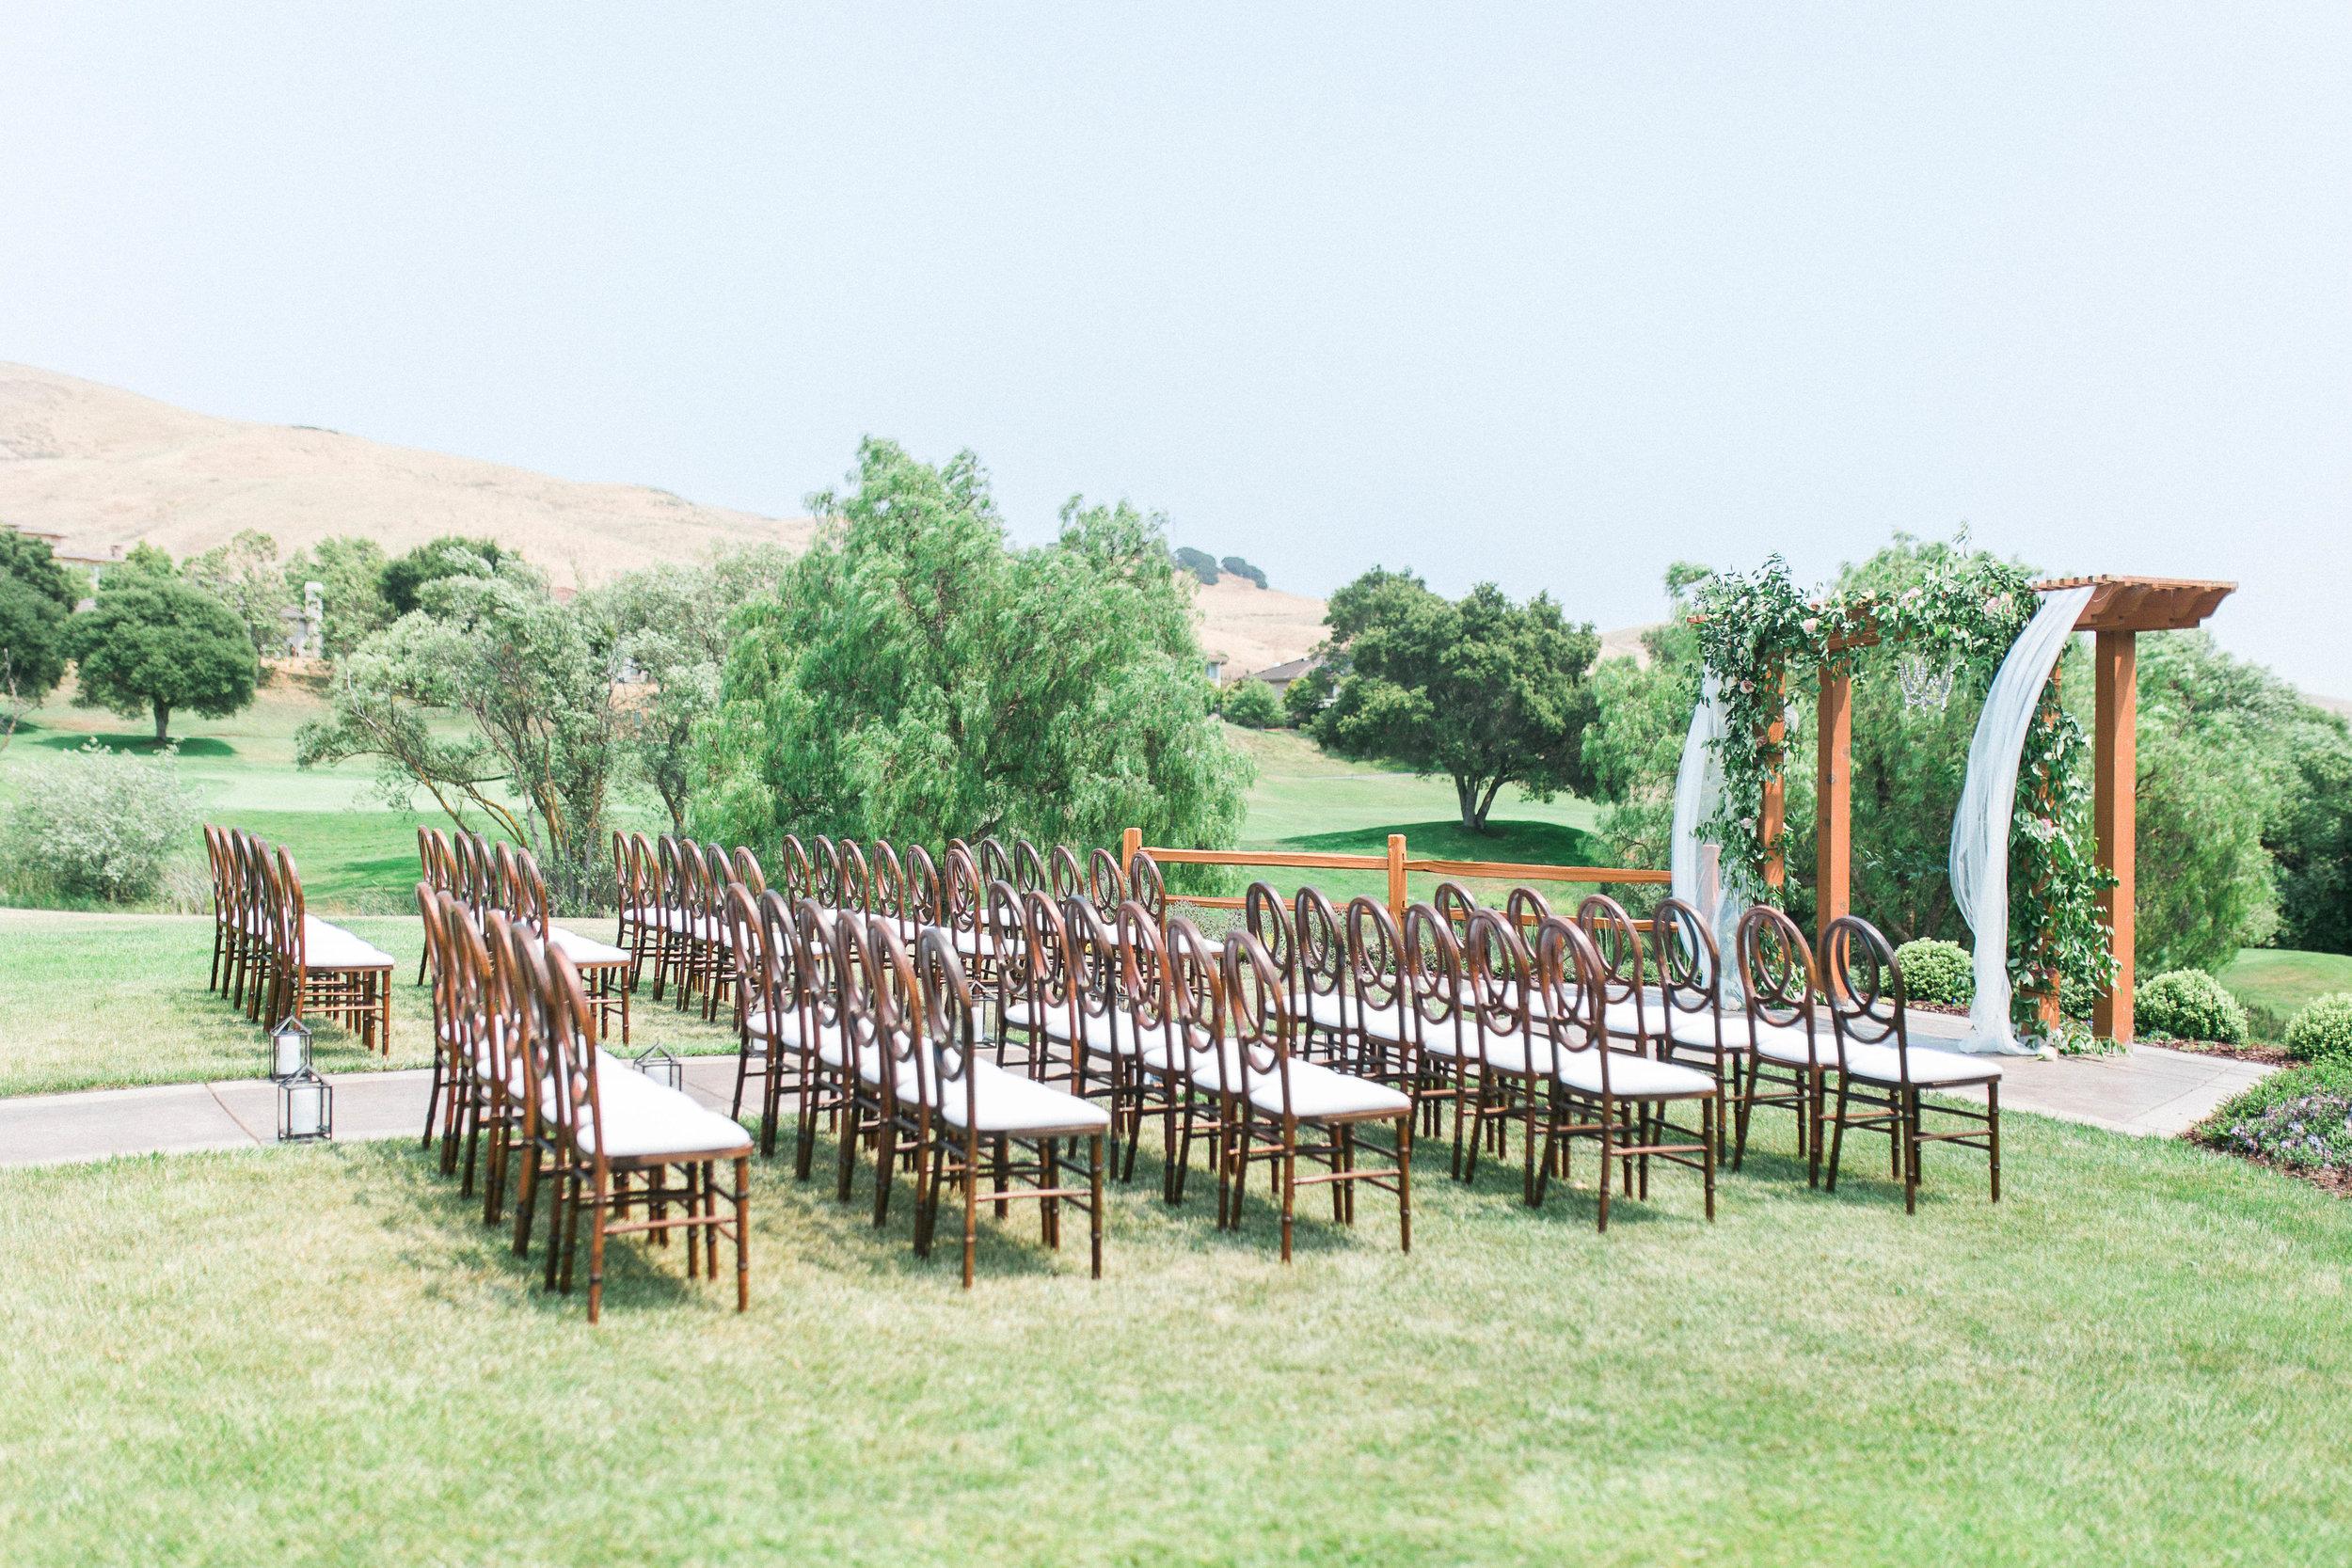 Hiddenbrooke-Wedding-Venue-by-JBJ-Pictures-22.jpg